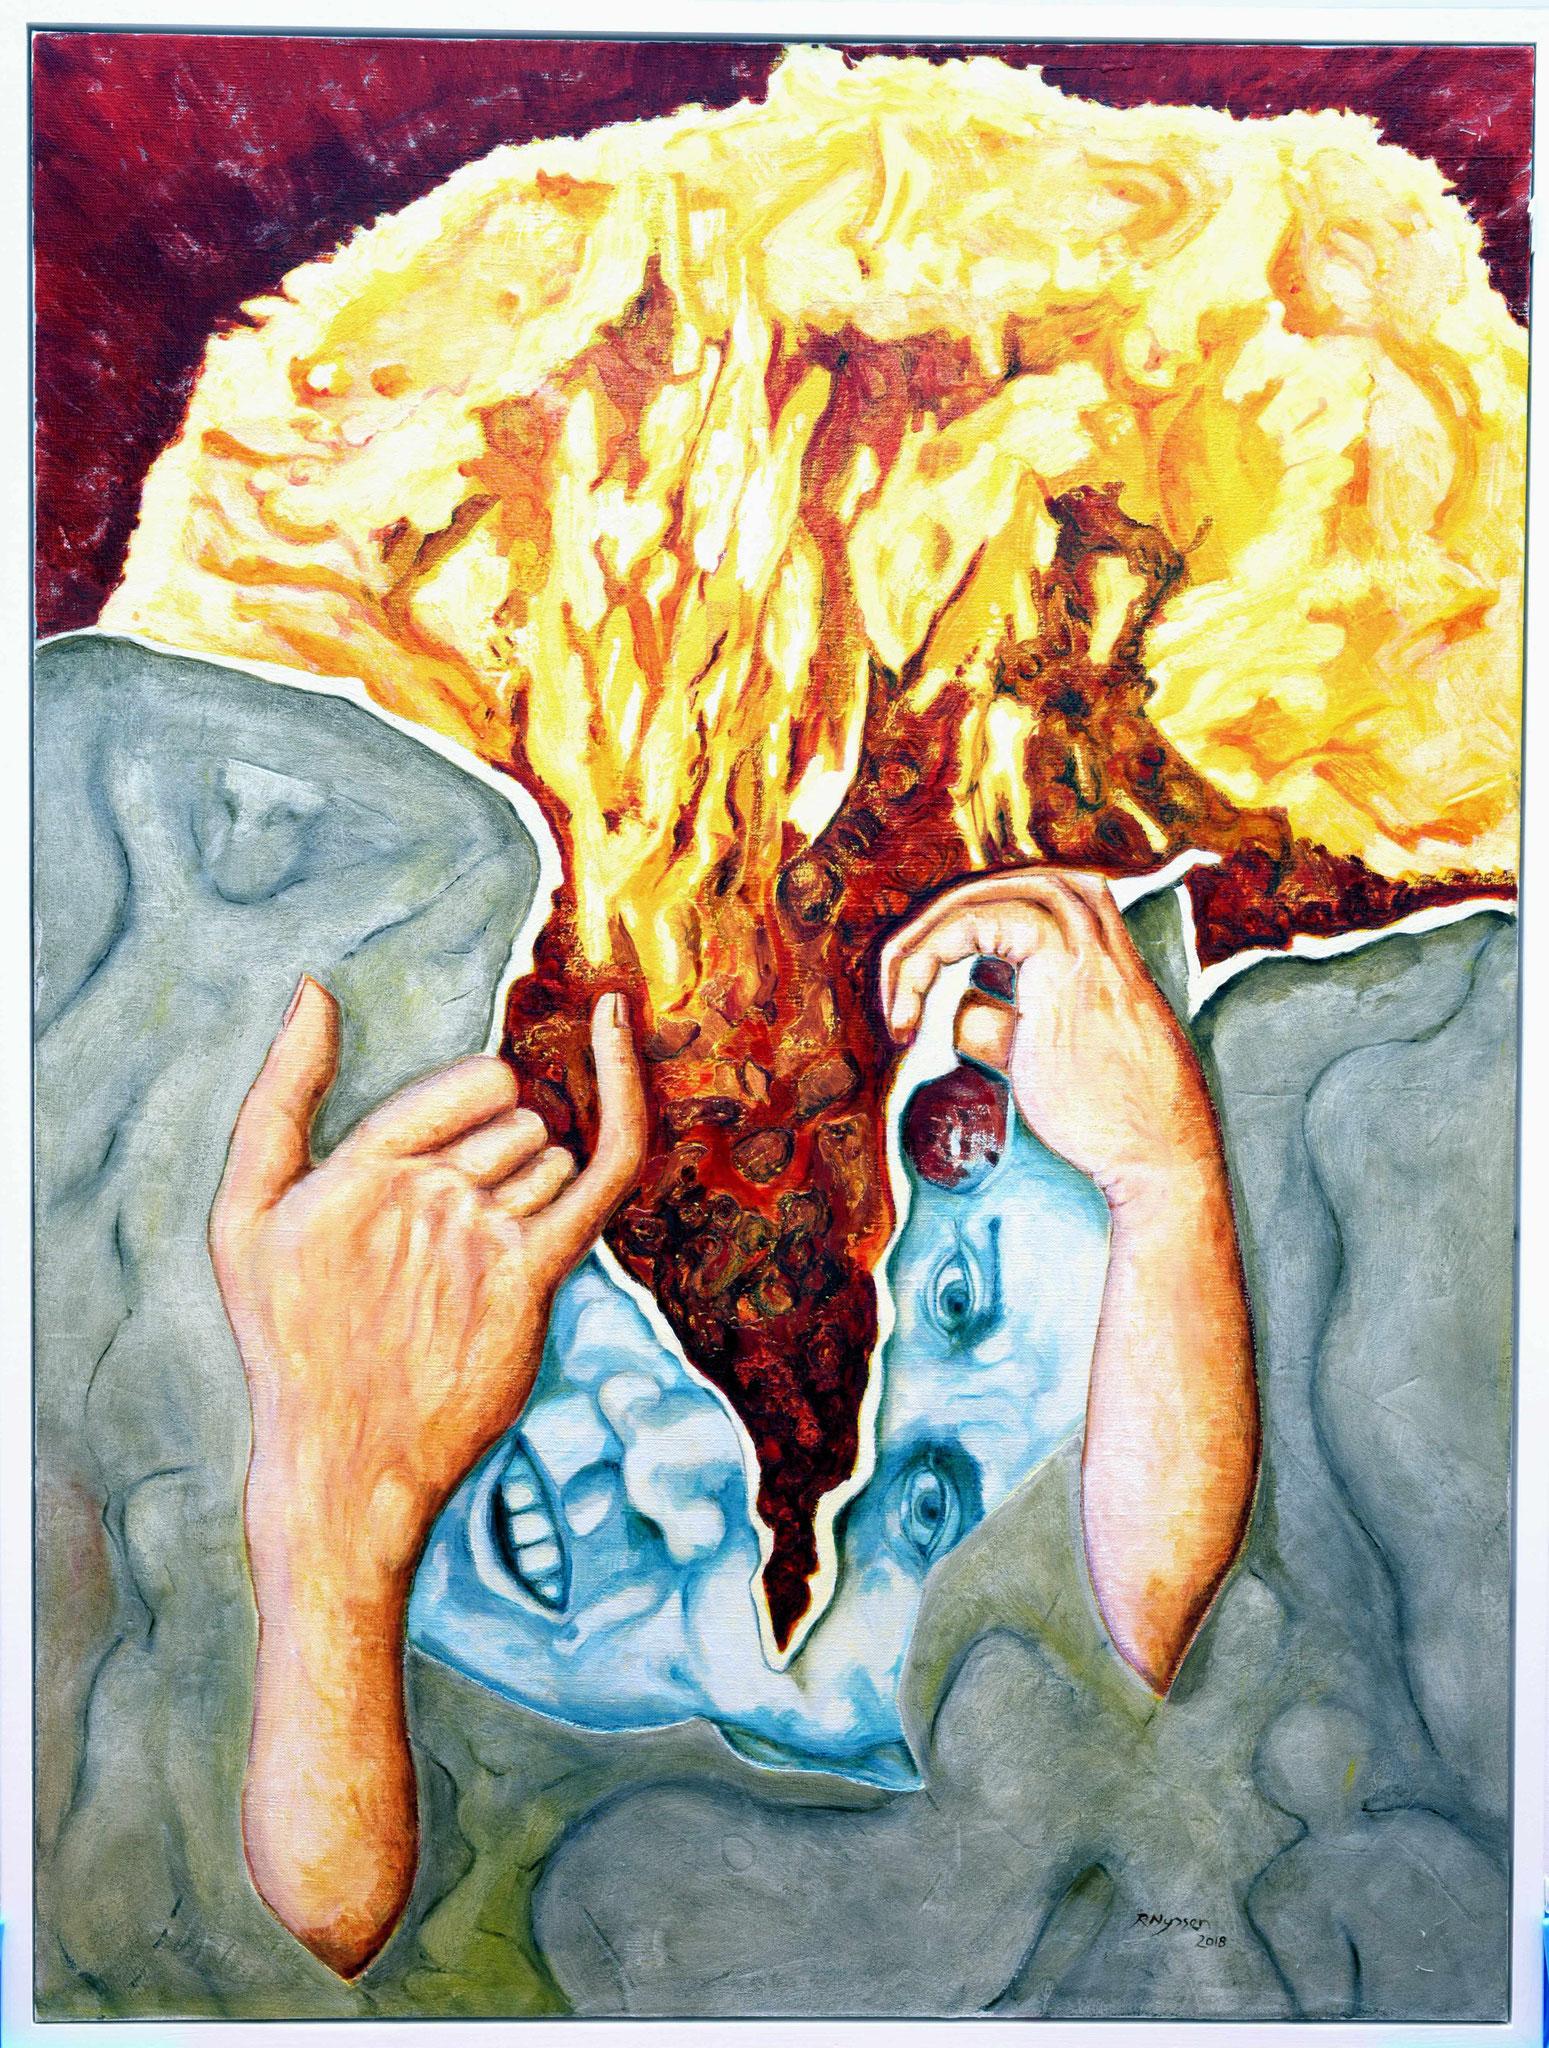 """Trisolaris III - Mentale Eskalation""-2018-Öl auf LW-160*120cm / (Mental excalation)-oil on canvas"